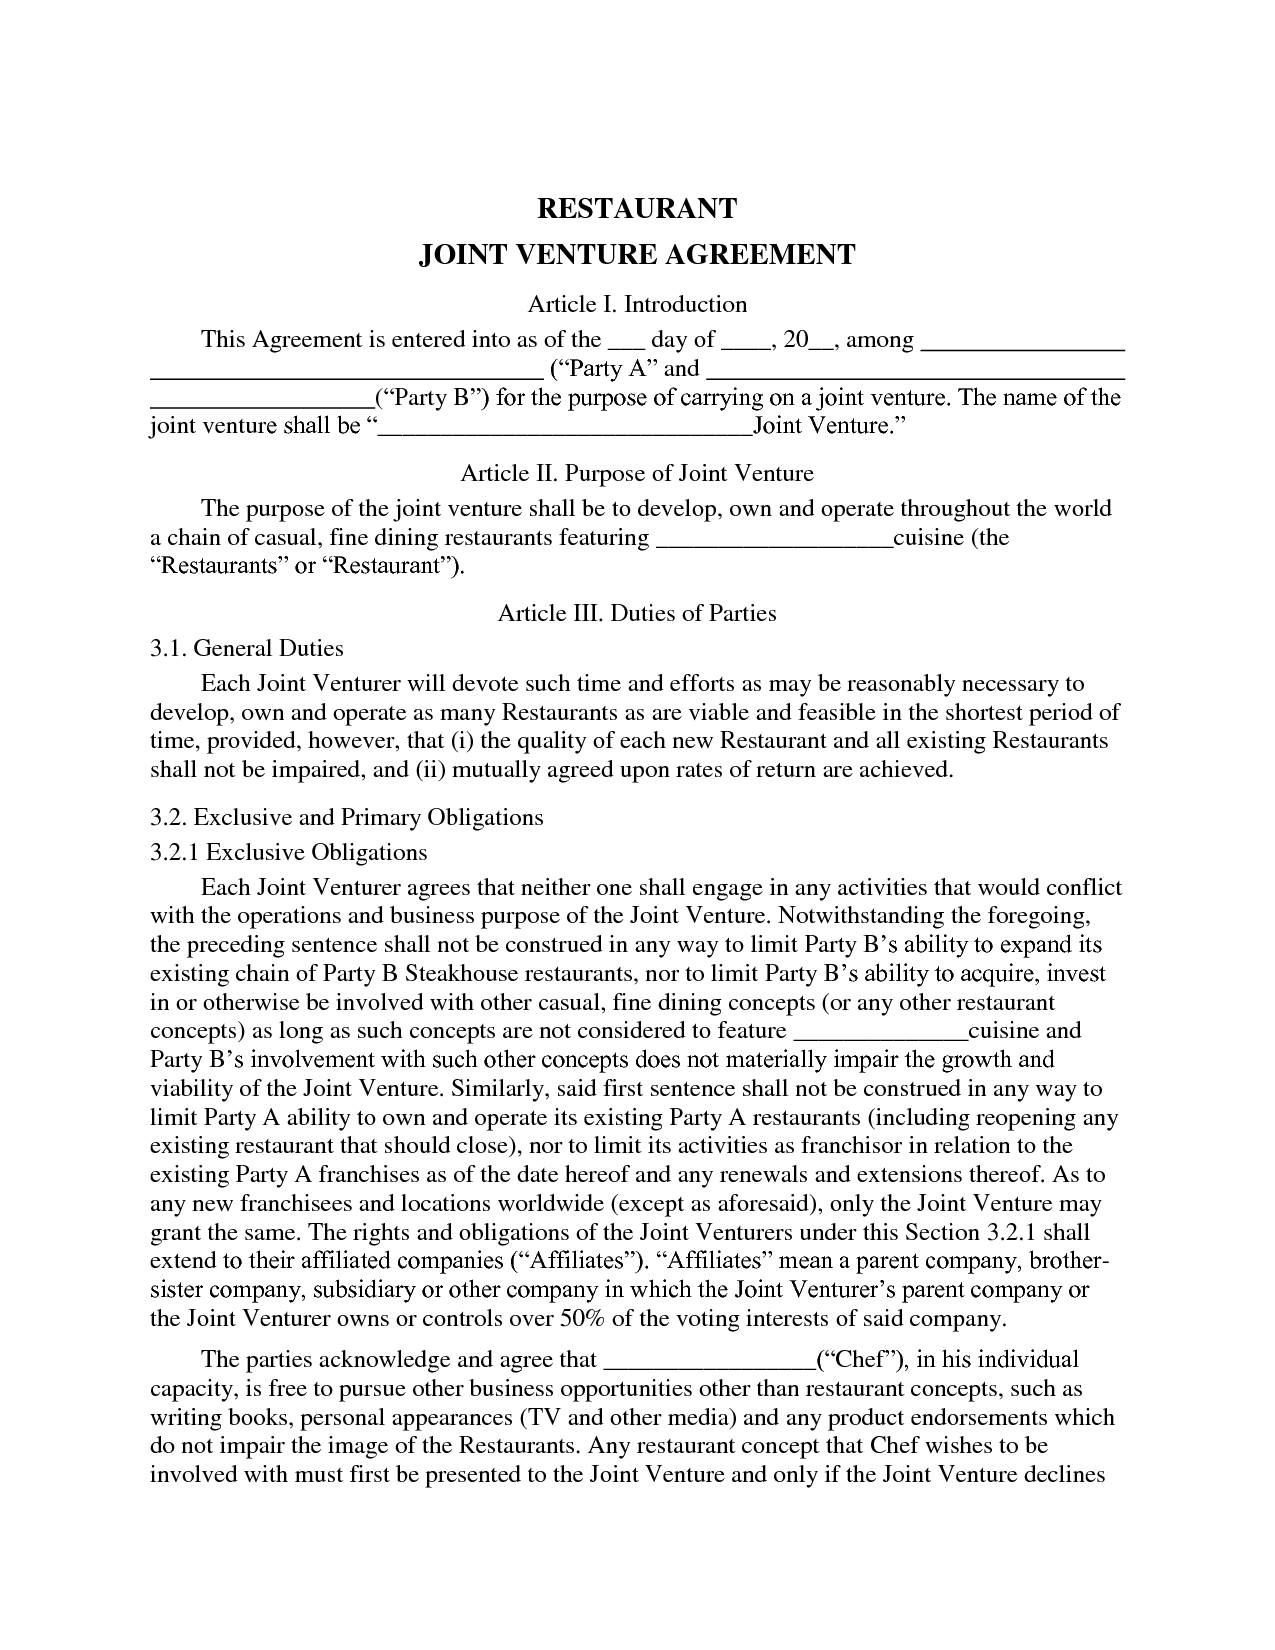 Sample Joint Venture Agreement Australia